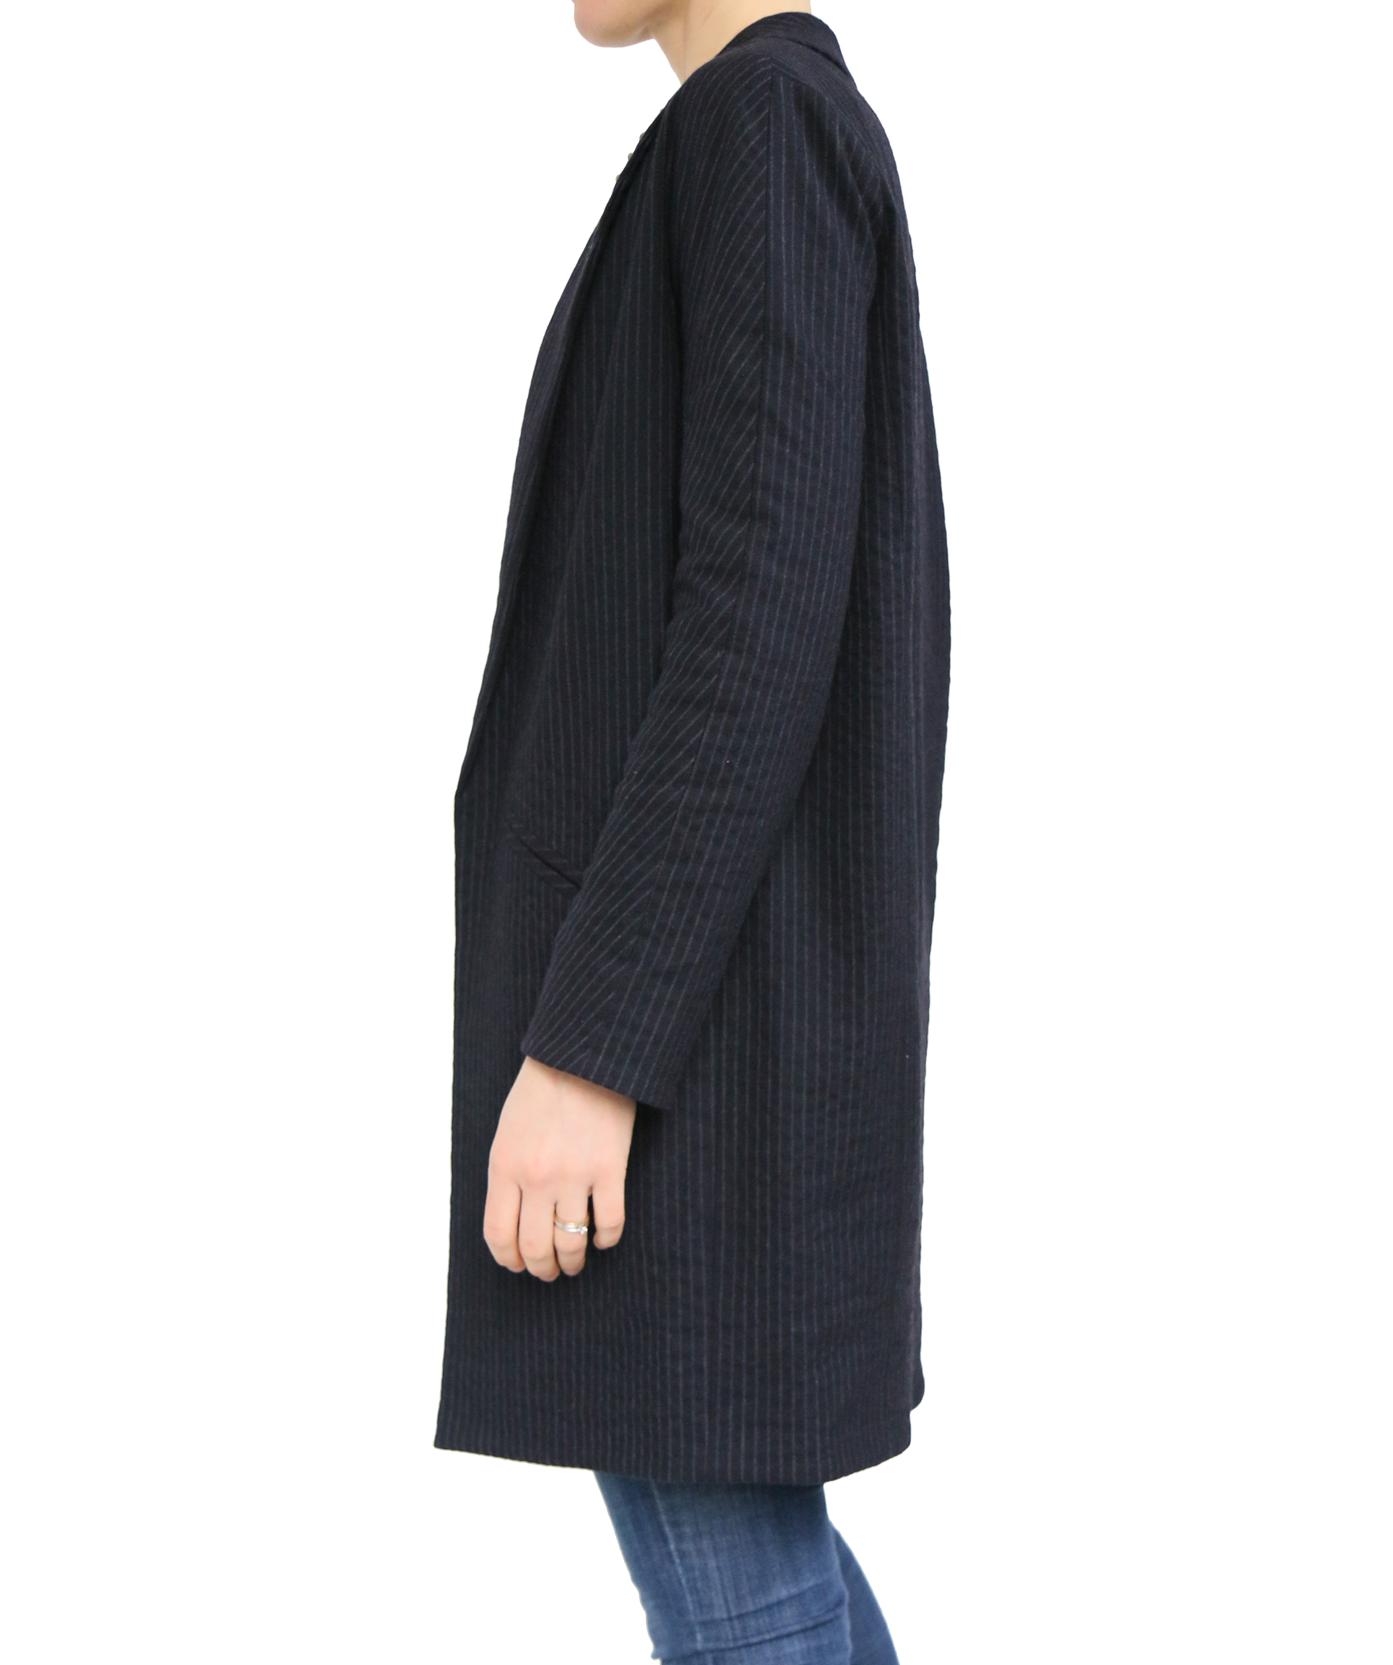 8-manteau-franceduvalstalla-patron-couture-atelier-scammit